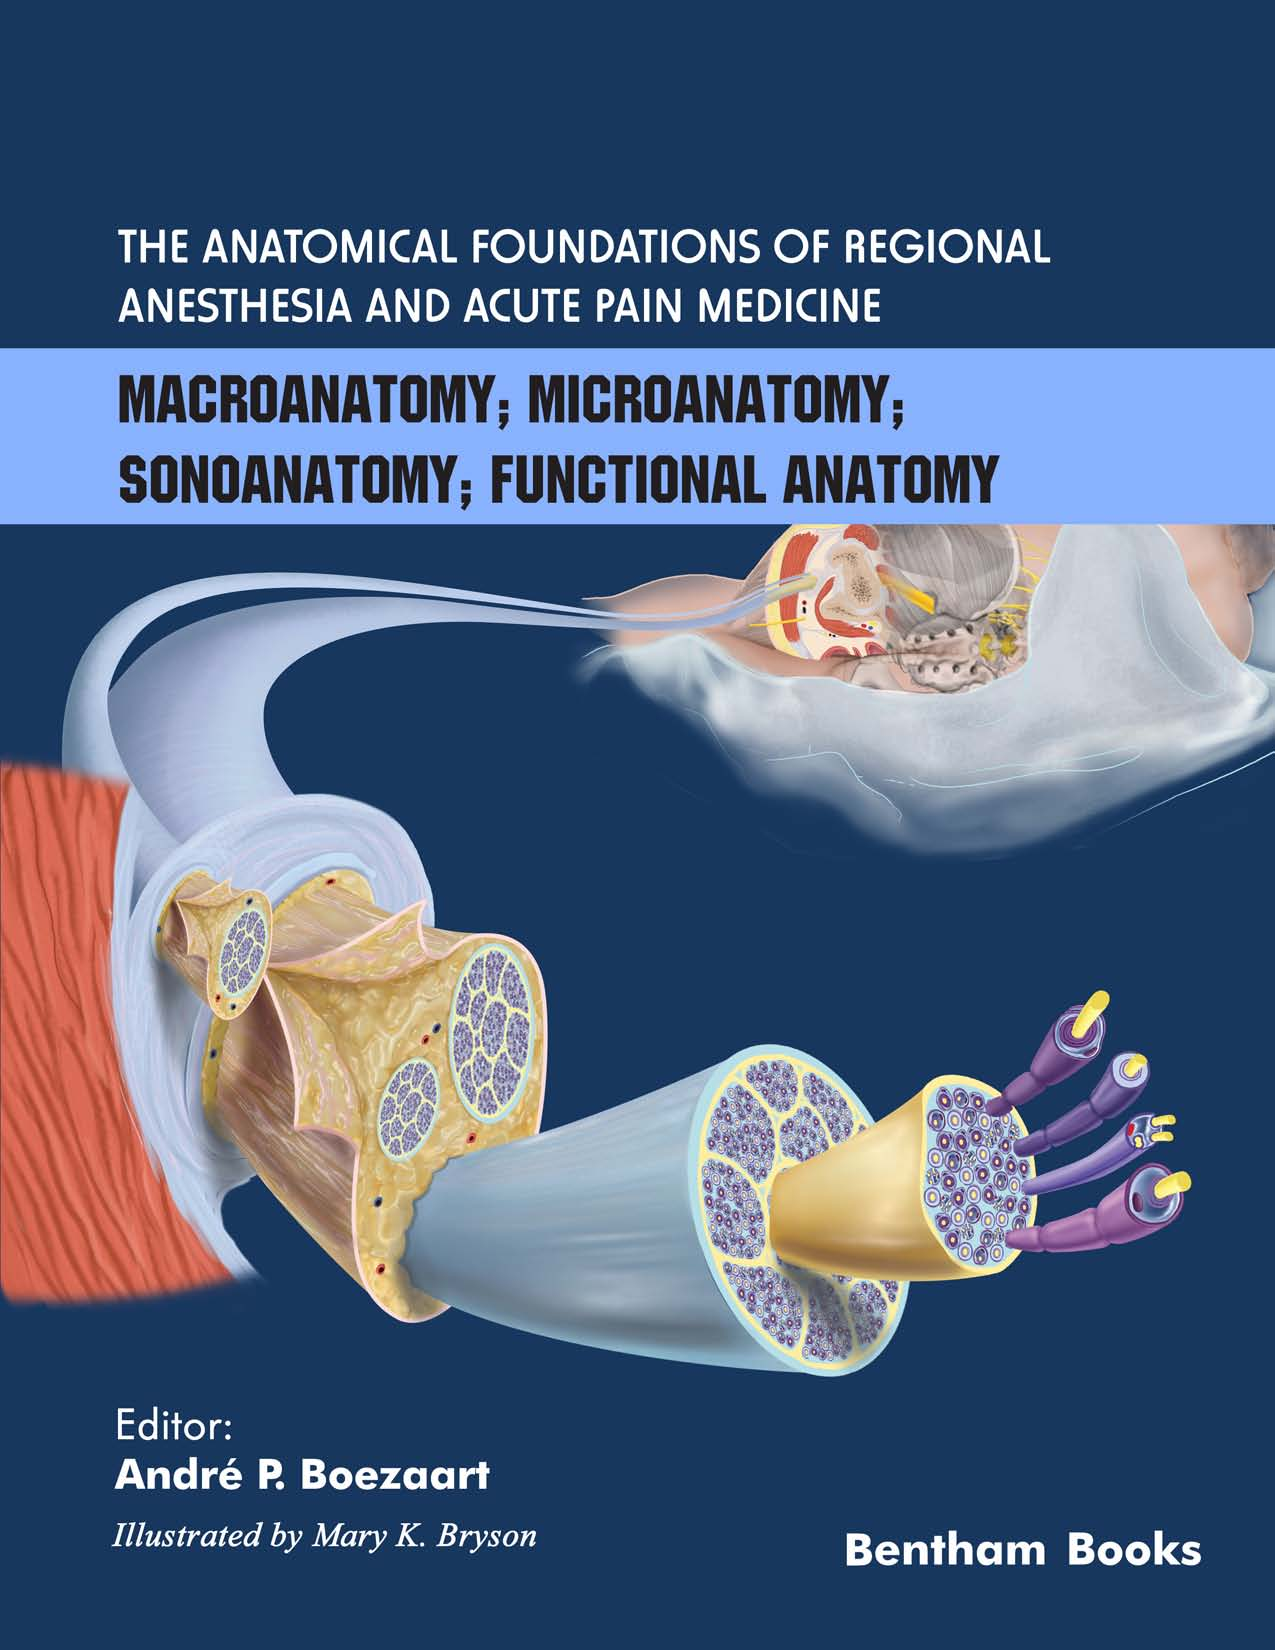 The Microanatomy of the Brachial Plexus and Peripheral Nerves